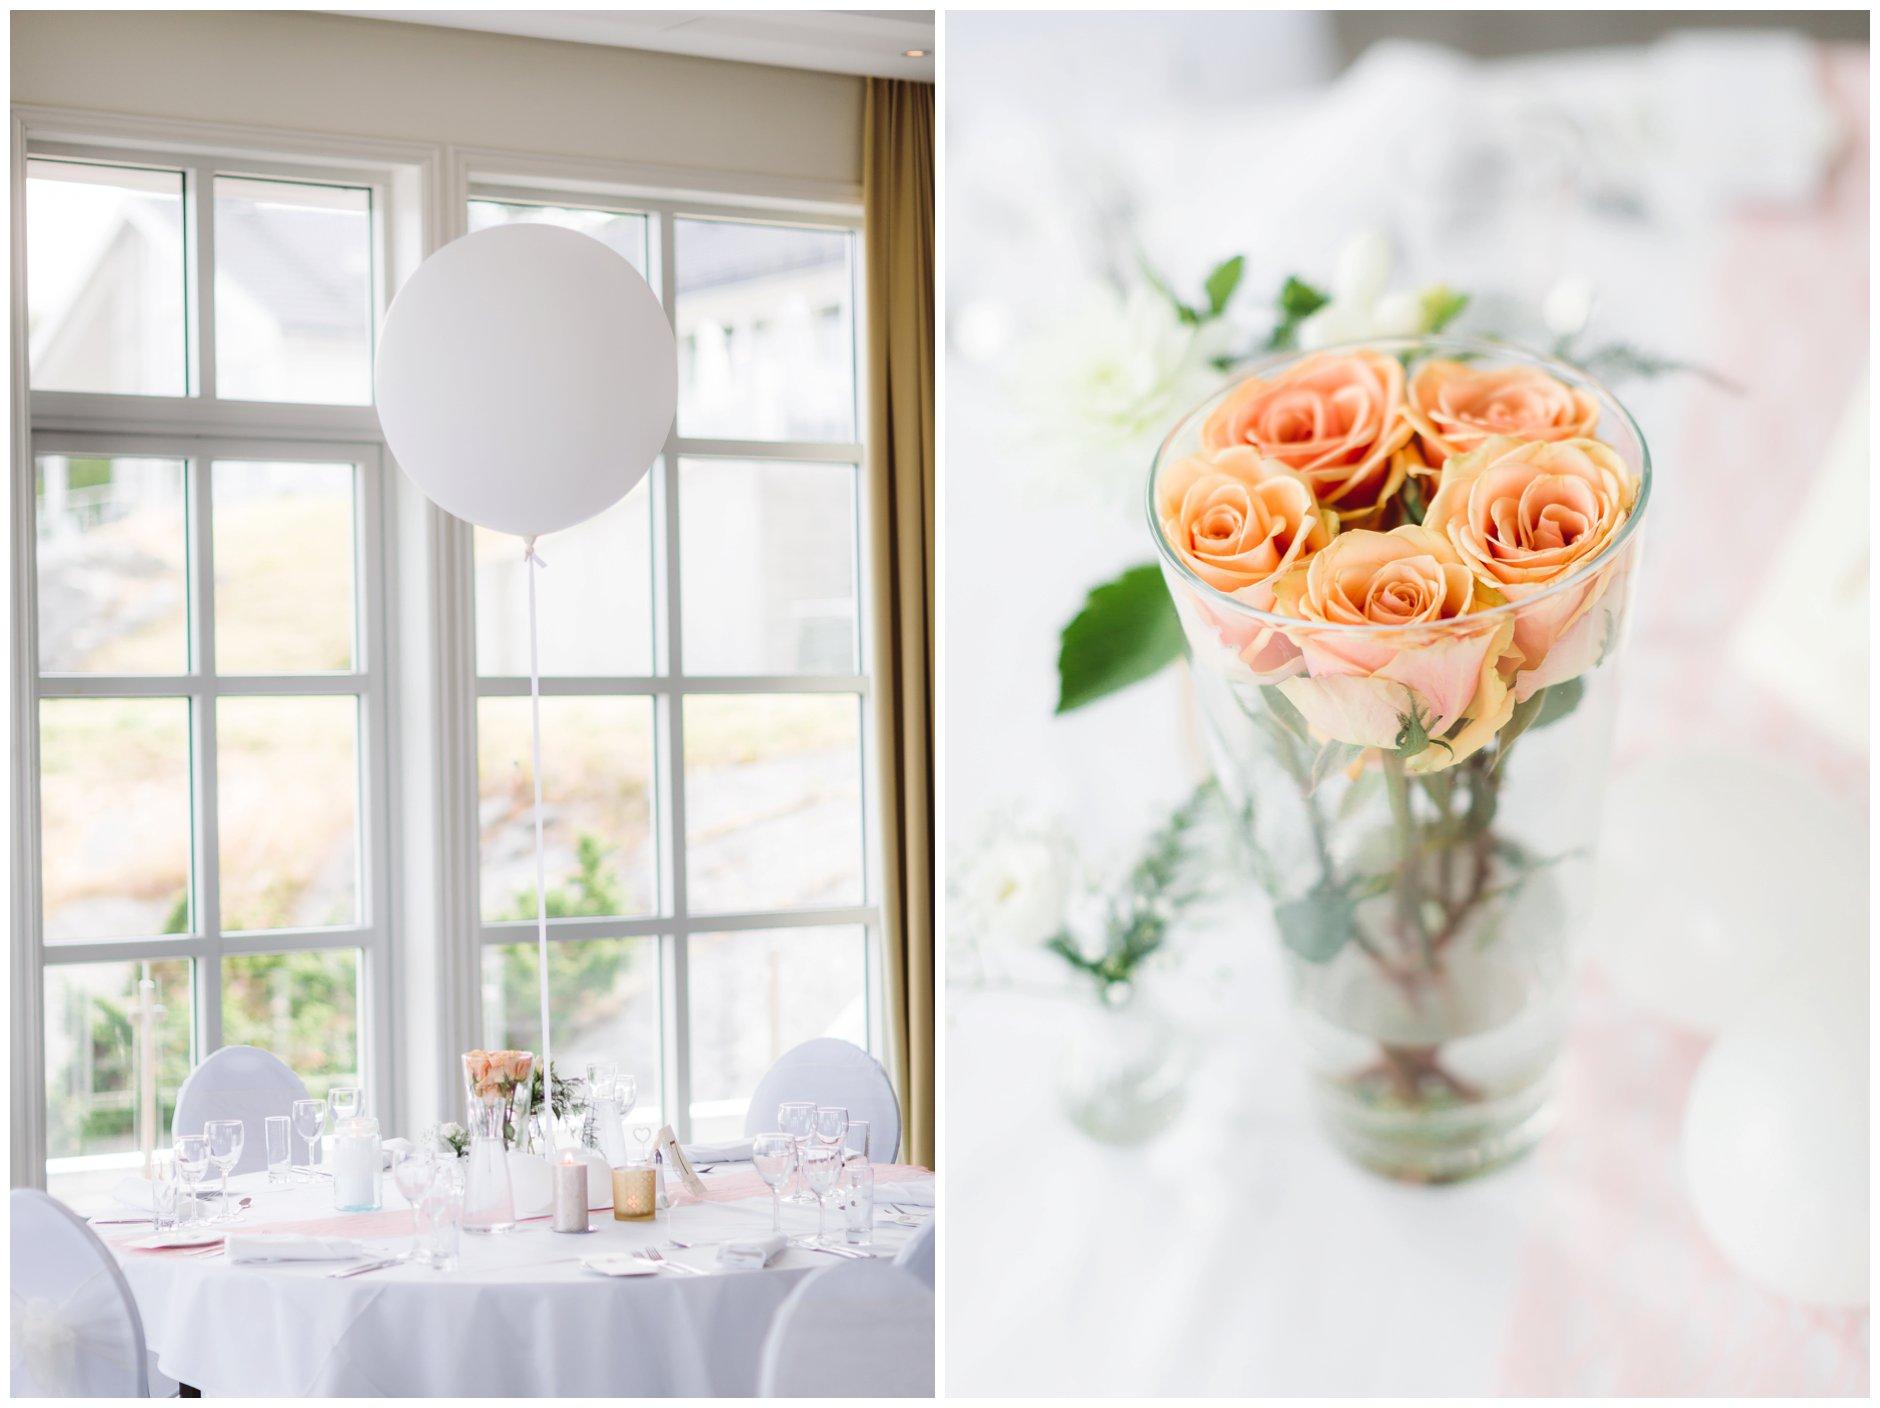 Pyntet bord bryllup på Scandic Tjøme med ballong